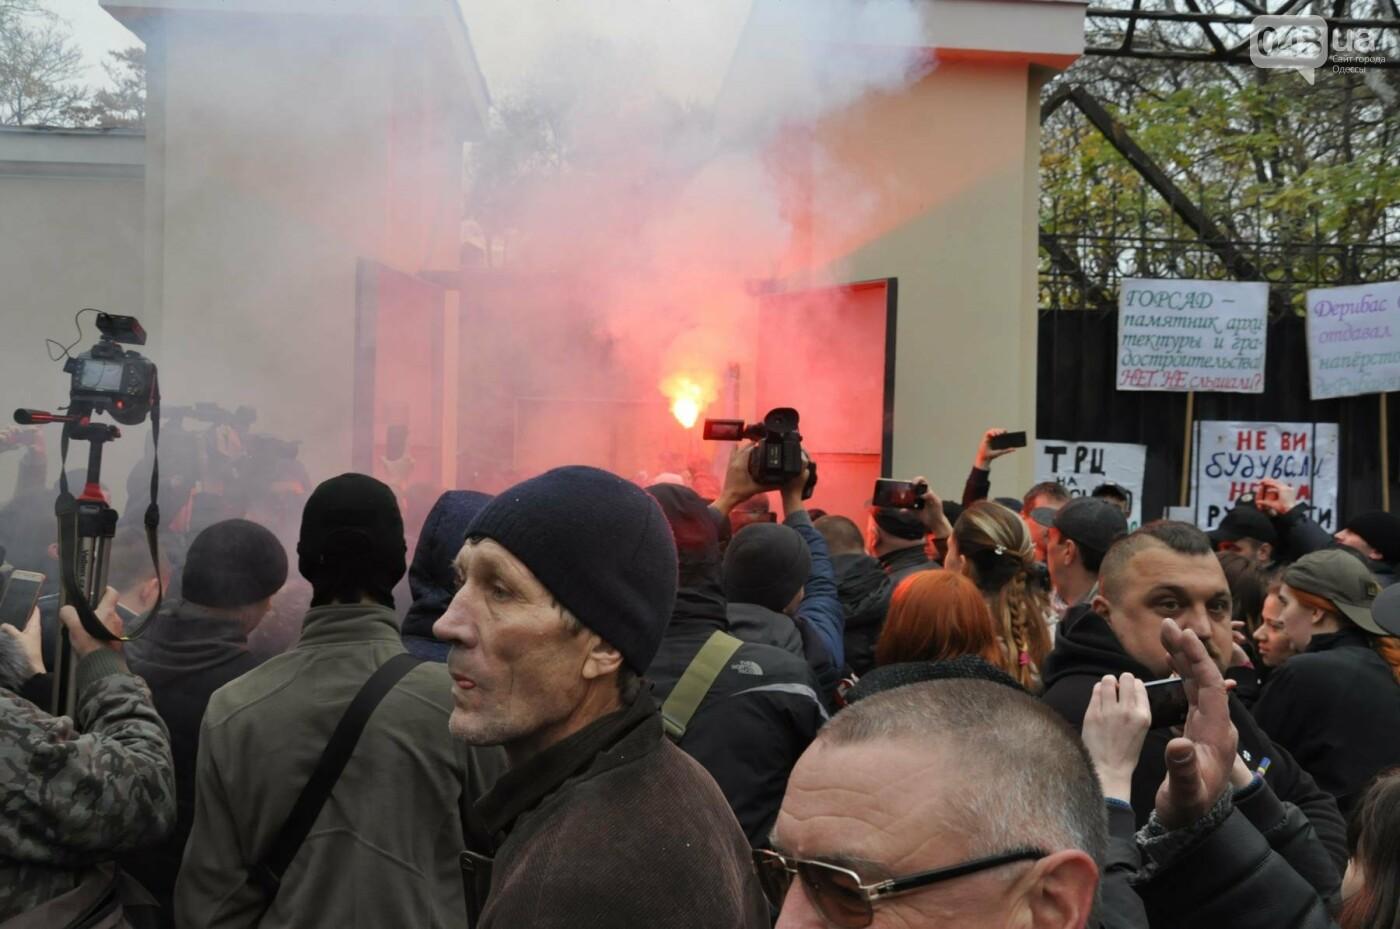 Около 5 сотен одесситов протестовали против застройки Горсада (ФОТО) , фото-7